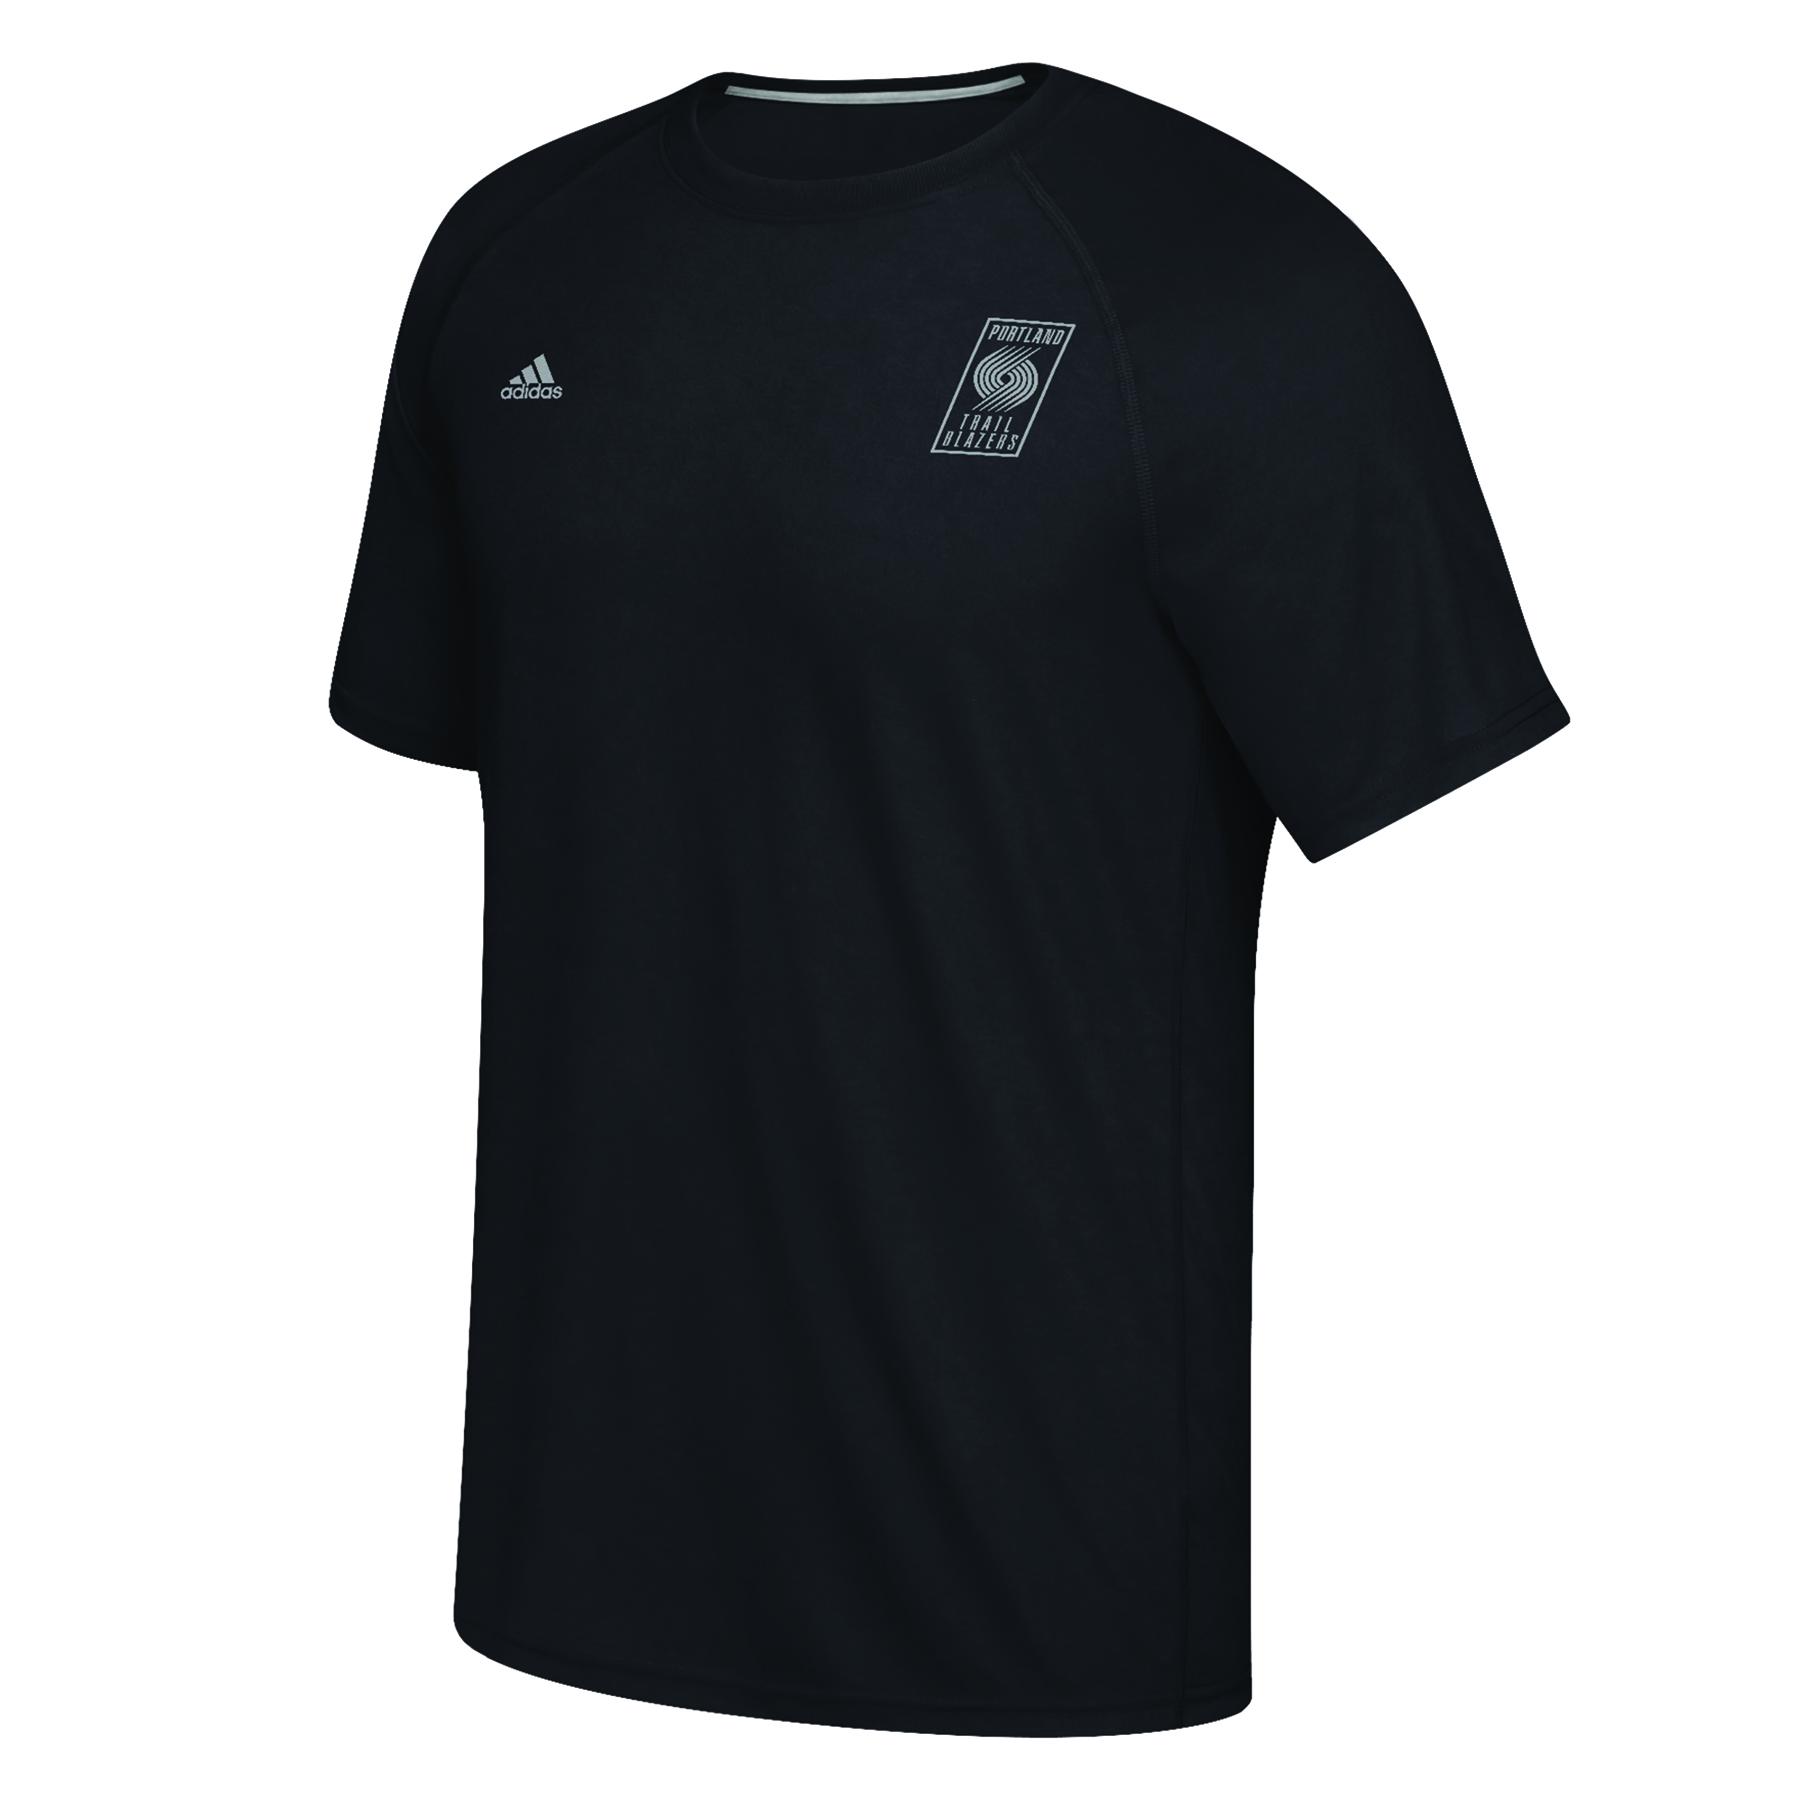 Portland Trail Blazers adidas Climalite Ultimate Short Sleeve T-Shirt